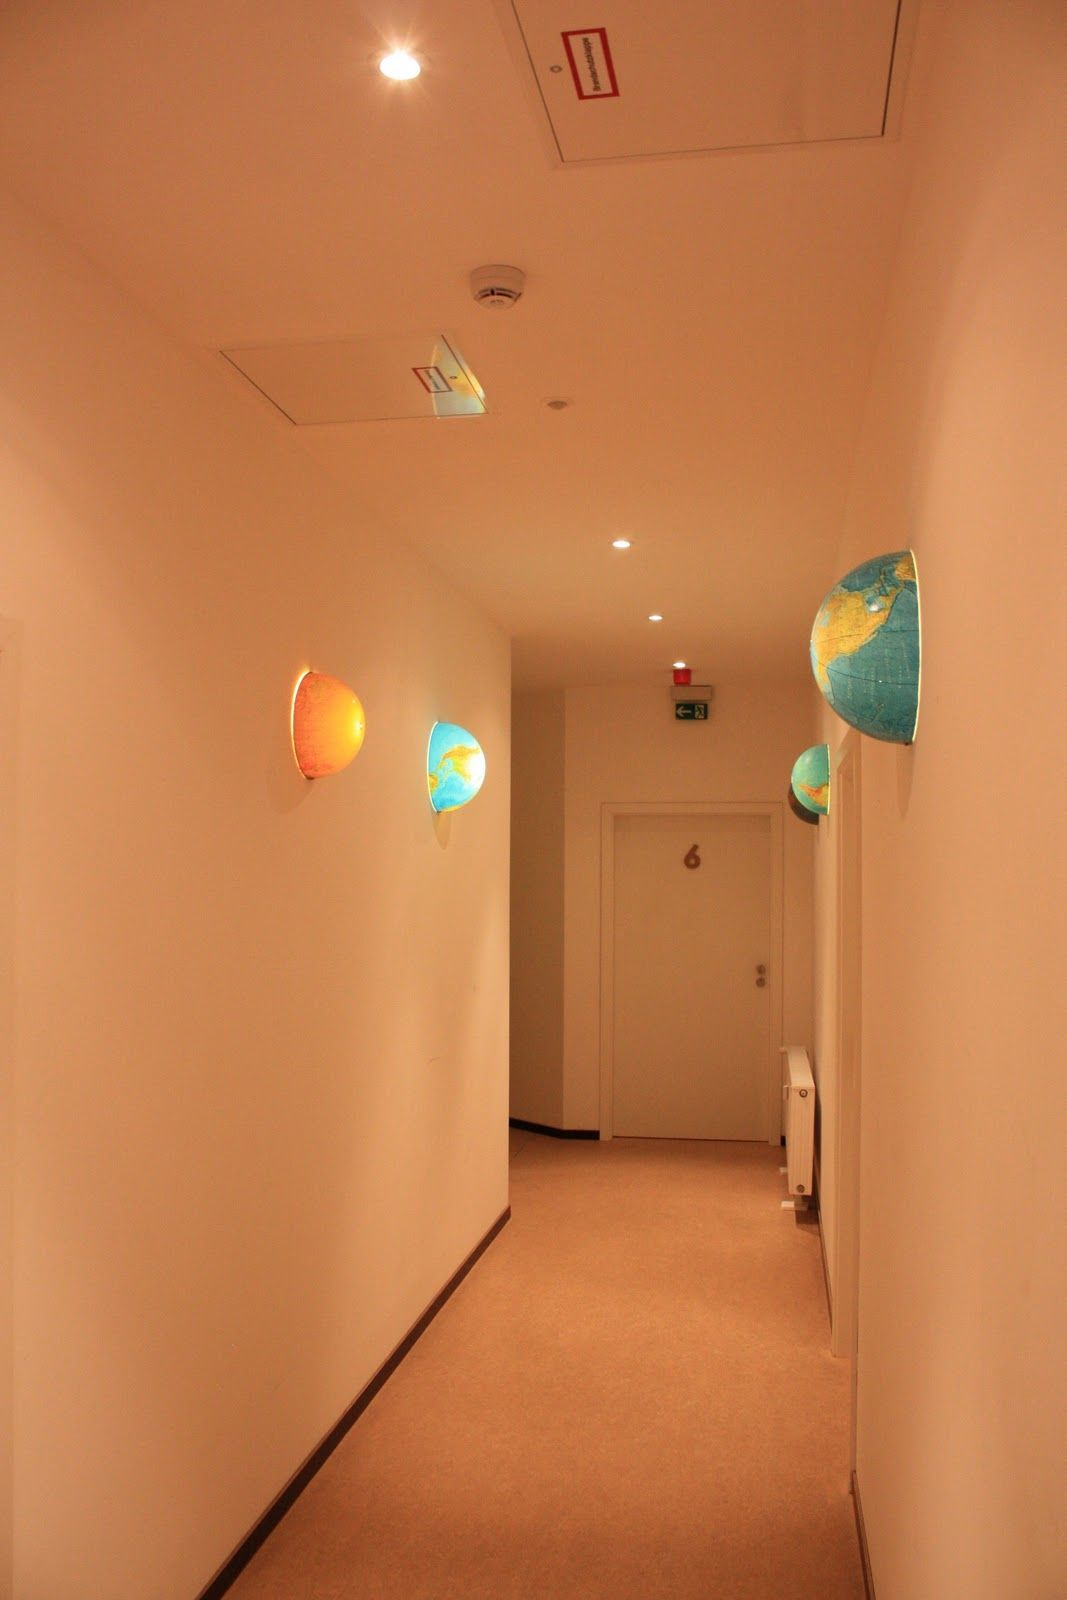 Betti S Globus Lampe Globes Galore Pinterest Room Indoor